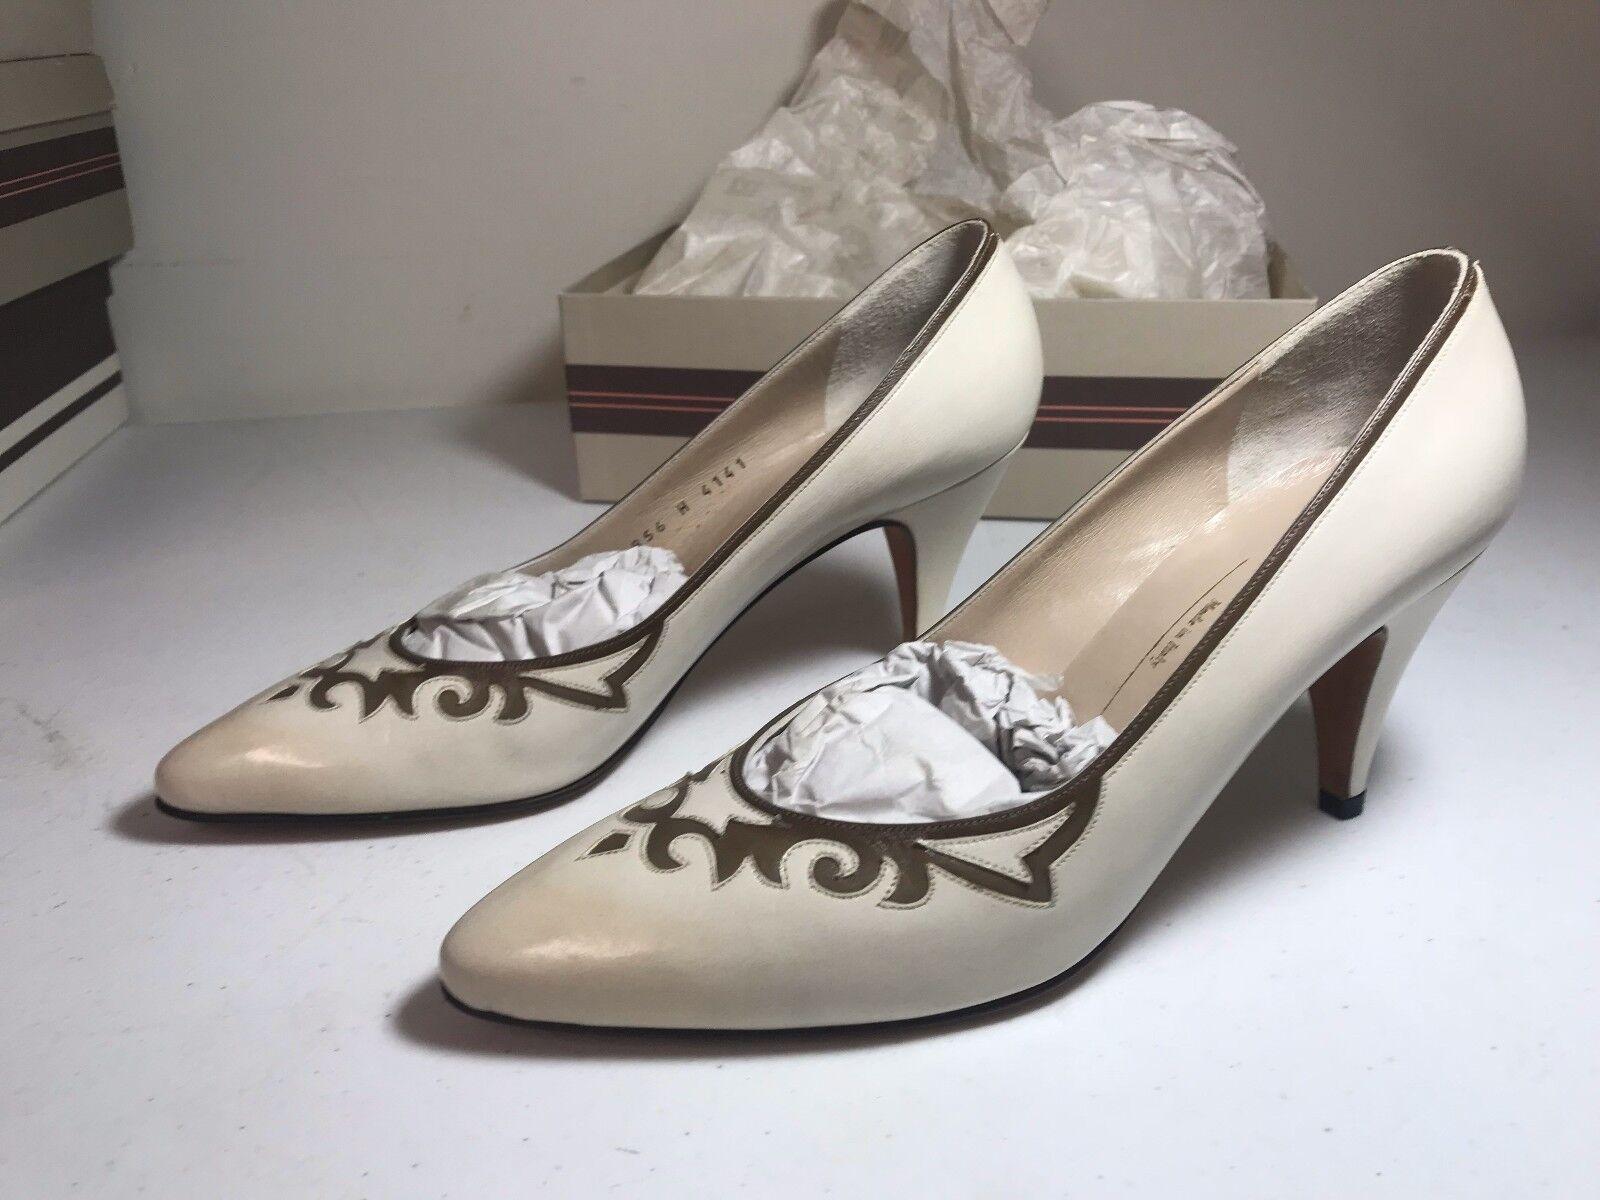 ordina adesso Italian Bruno Magli donna Pumps scarpe Winter bianca bianca bianca Leather 8.5 AAAA  Senza tasse